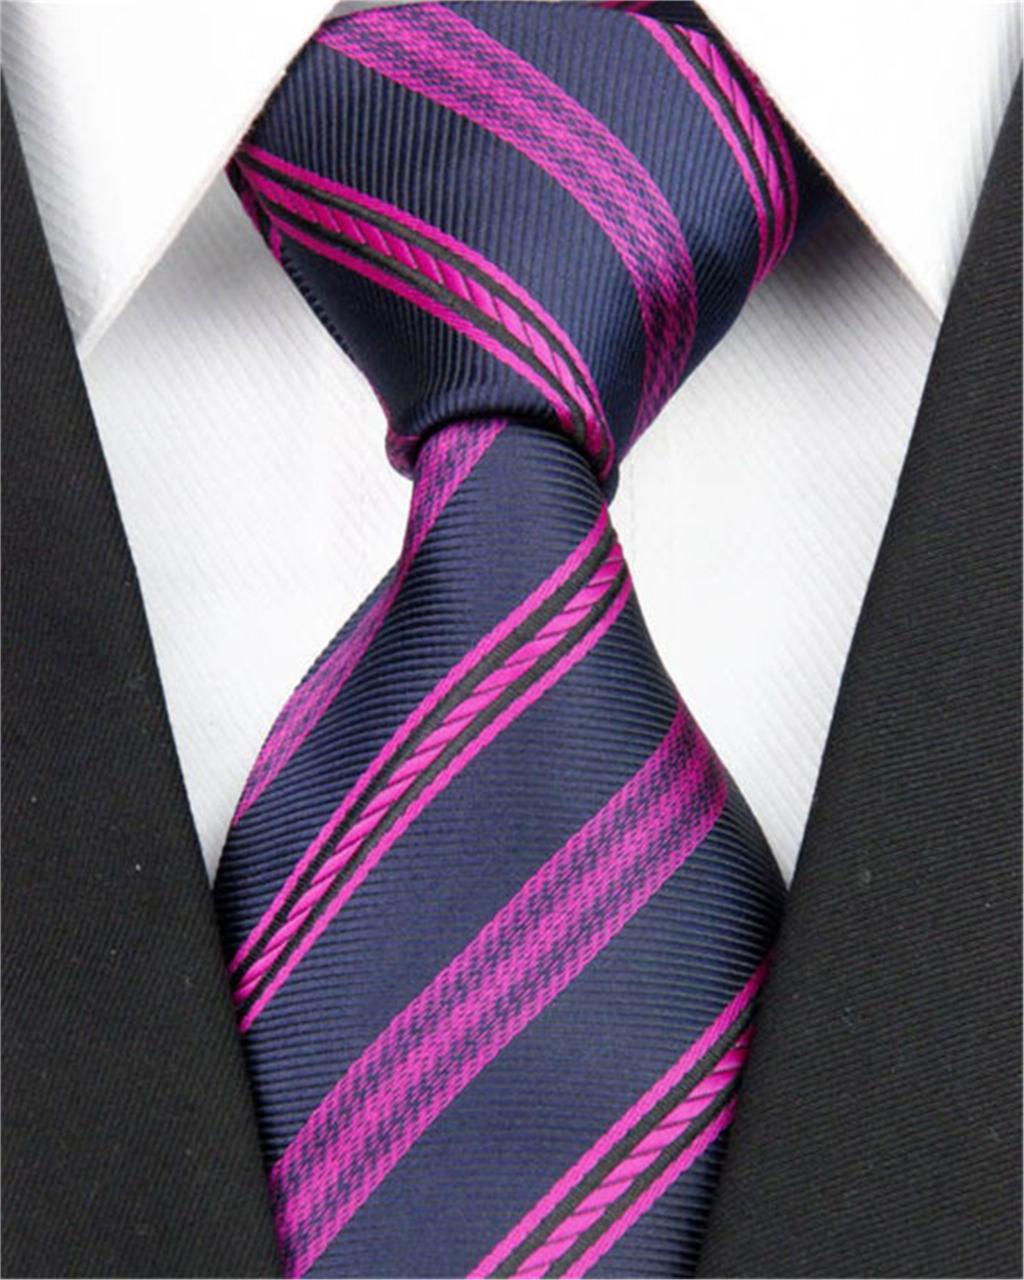 Men Necktie Purple Dark Blue Jacquard Woven Men's Accessories 100% Silk Striped Tie Business Party Prom Nt147(China (Mainland))